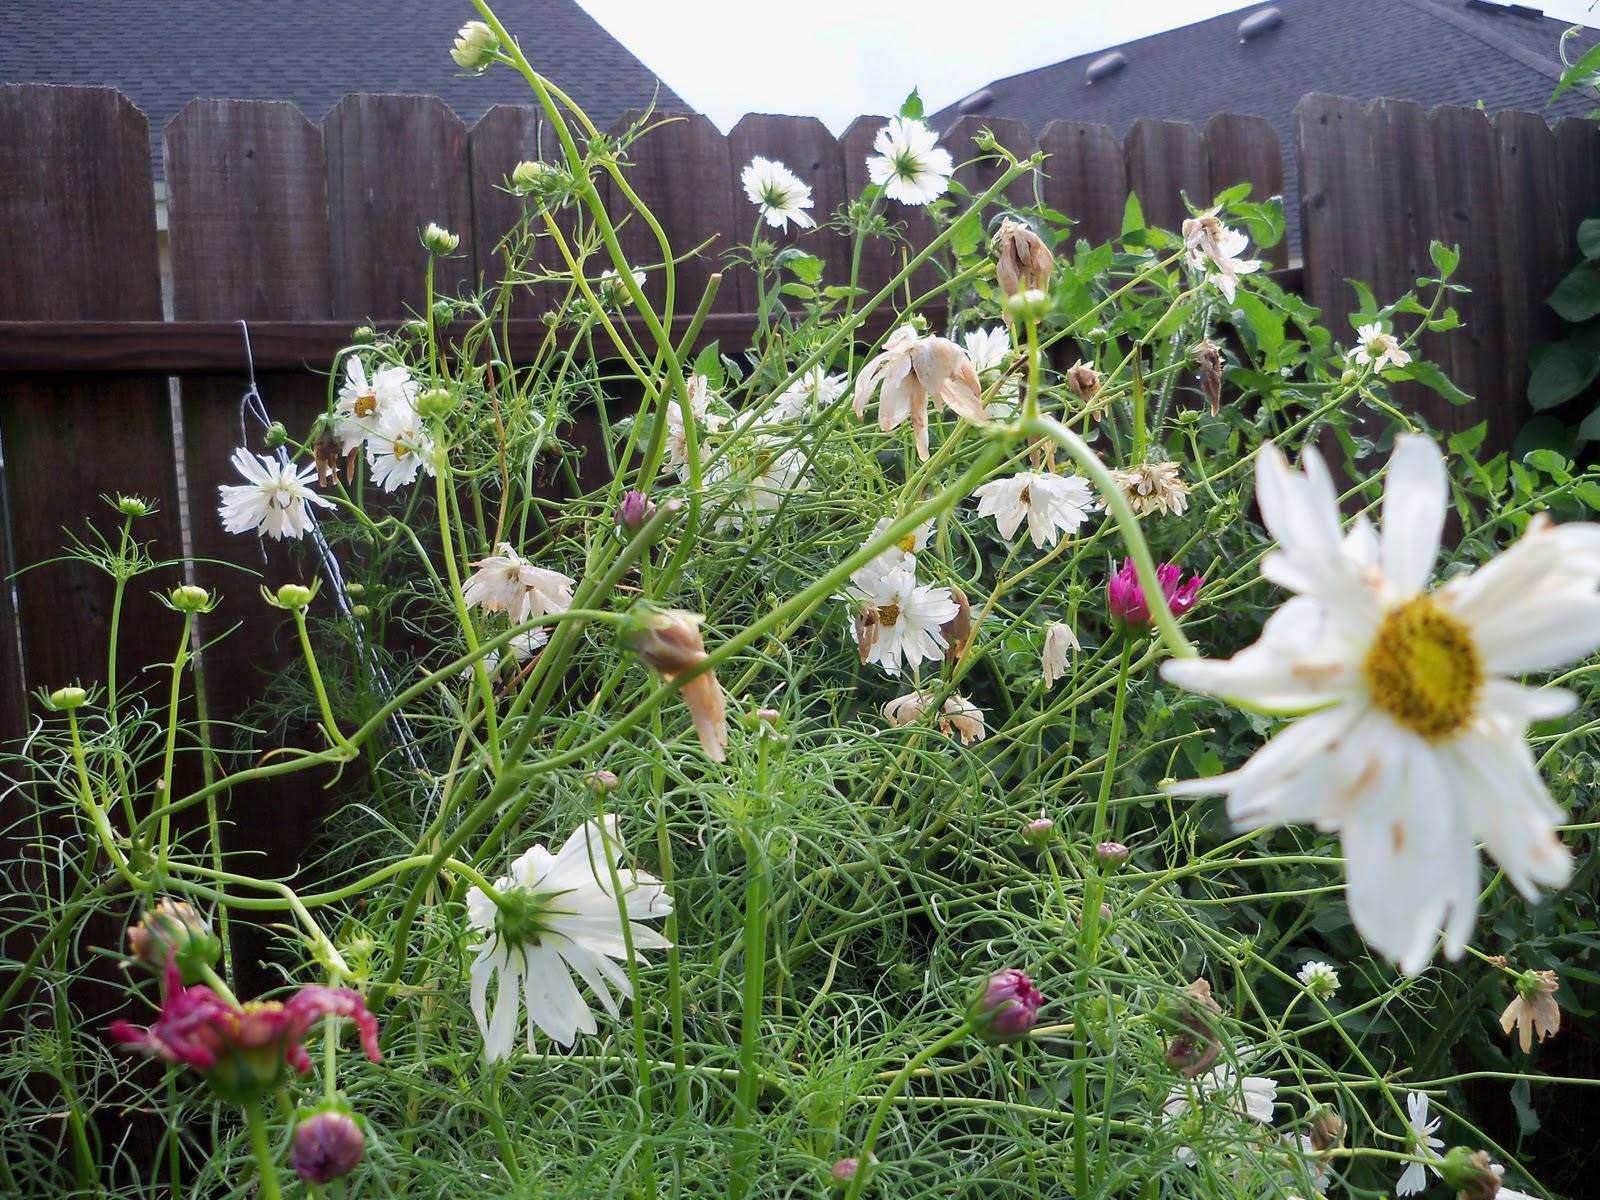 Gardening 2010, Part Three - 101_4694.JPG